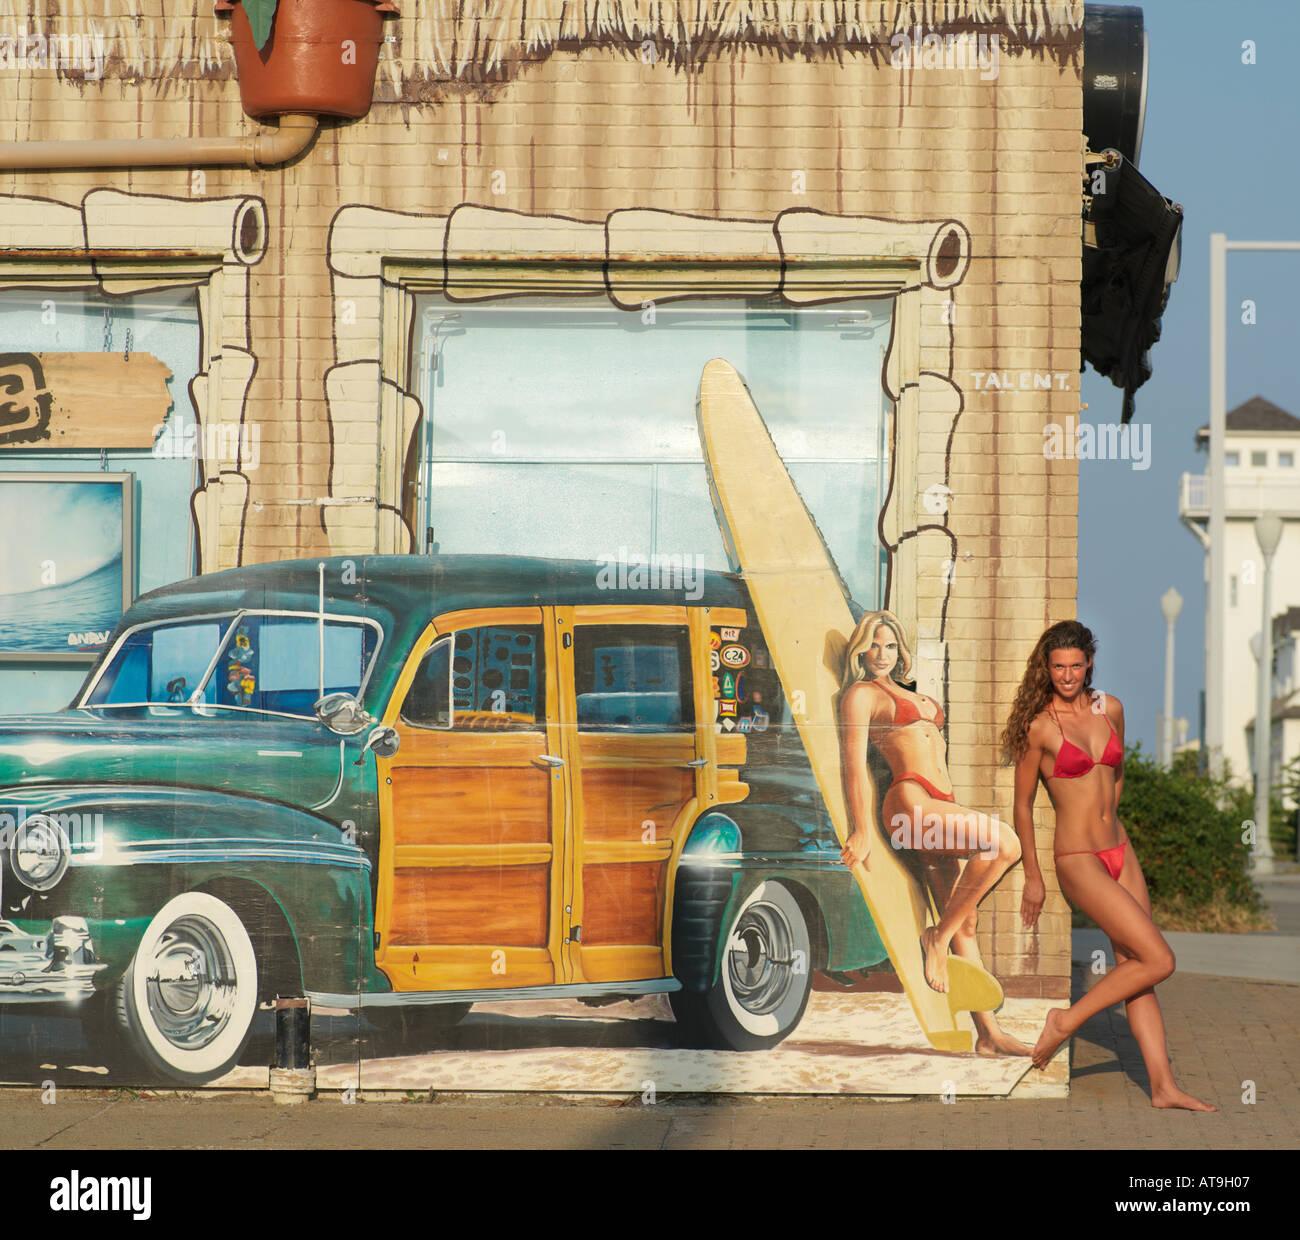 Woman in red bikini mimics woman in wall mural Corner 24 Surf Shop Virginia Beach VA - Stock Image